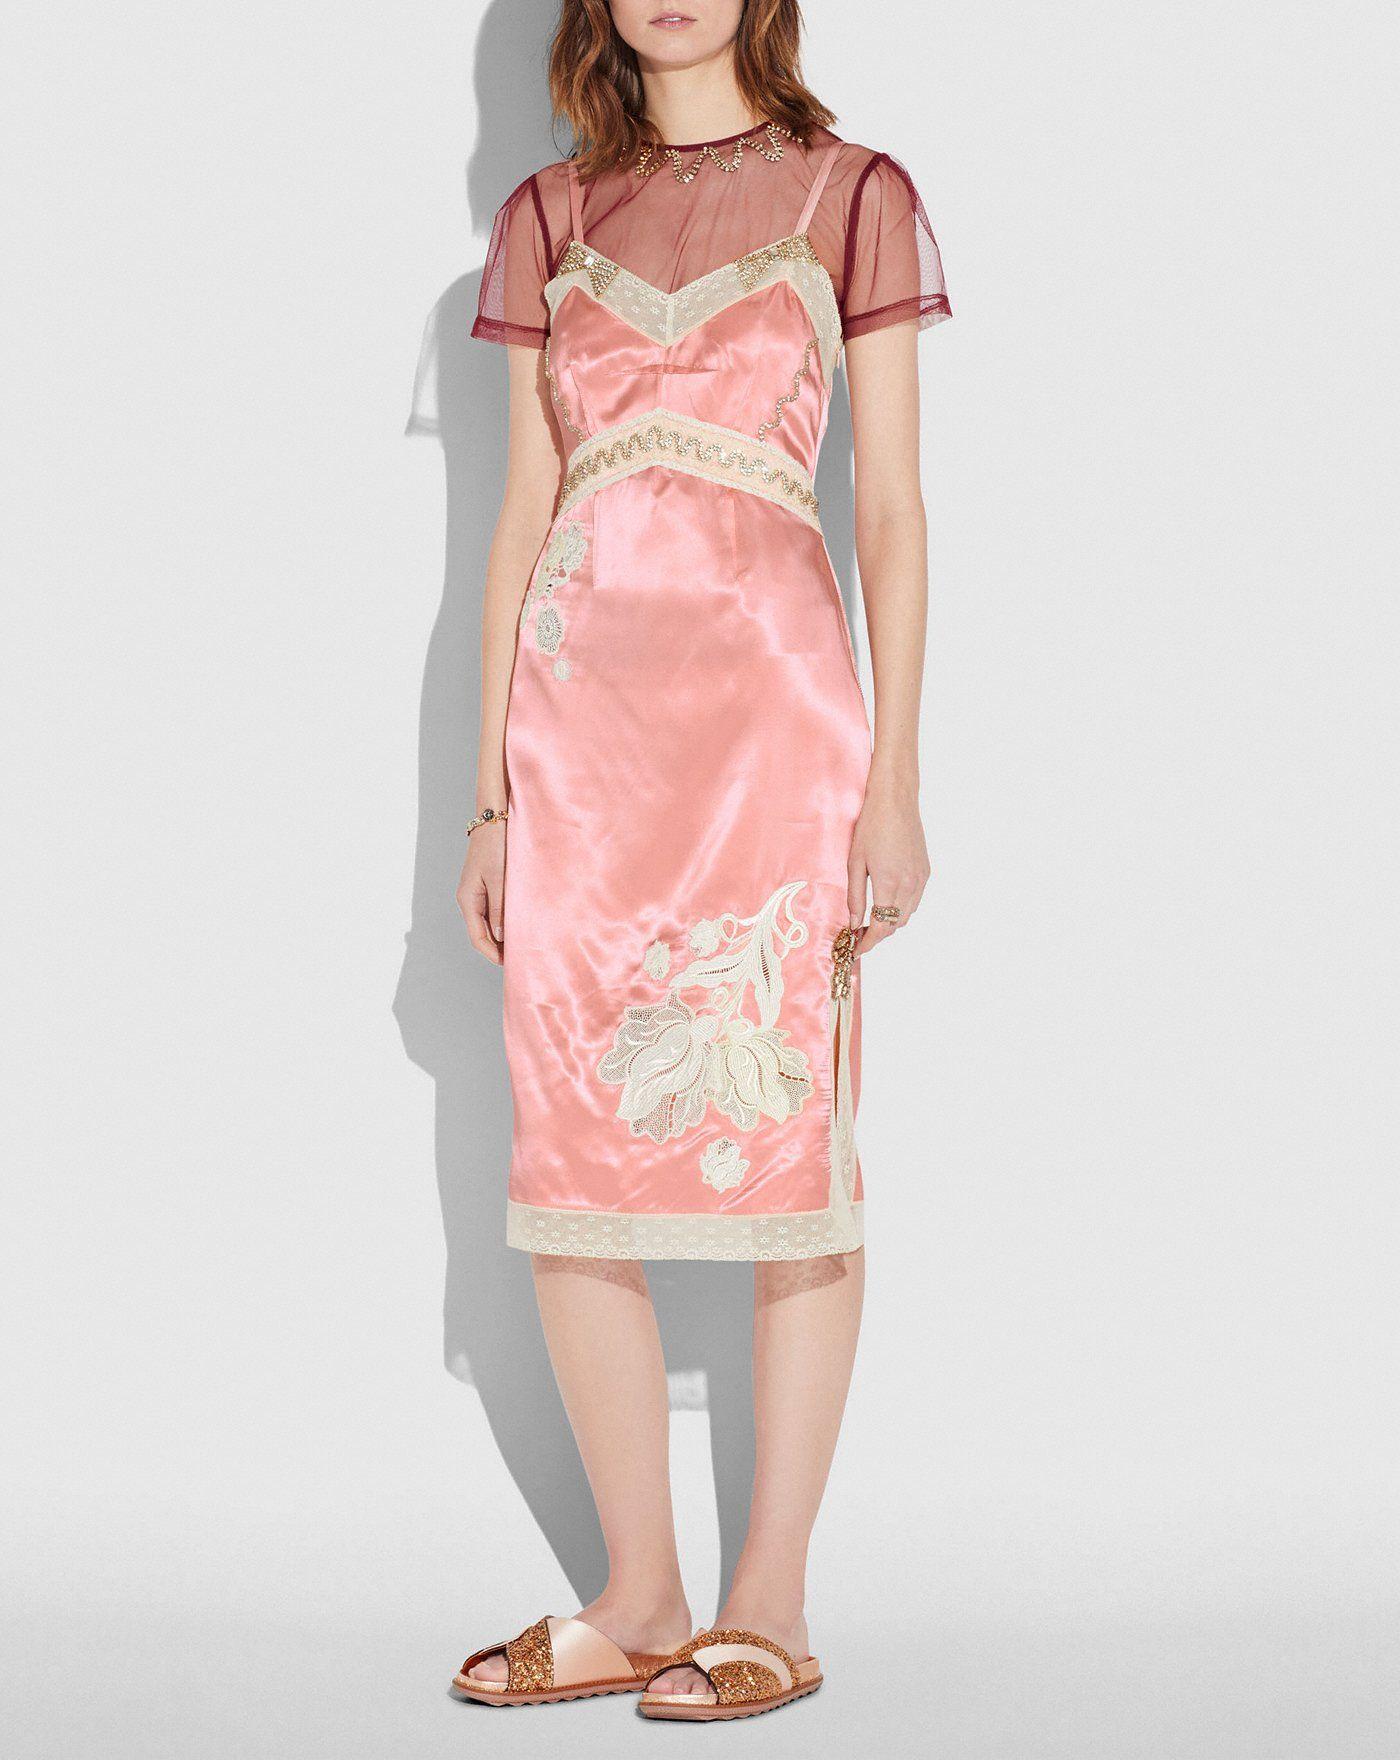 #PopbelaOOTD: Tampil Playful dengan Slip Dress